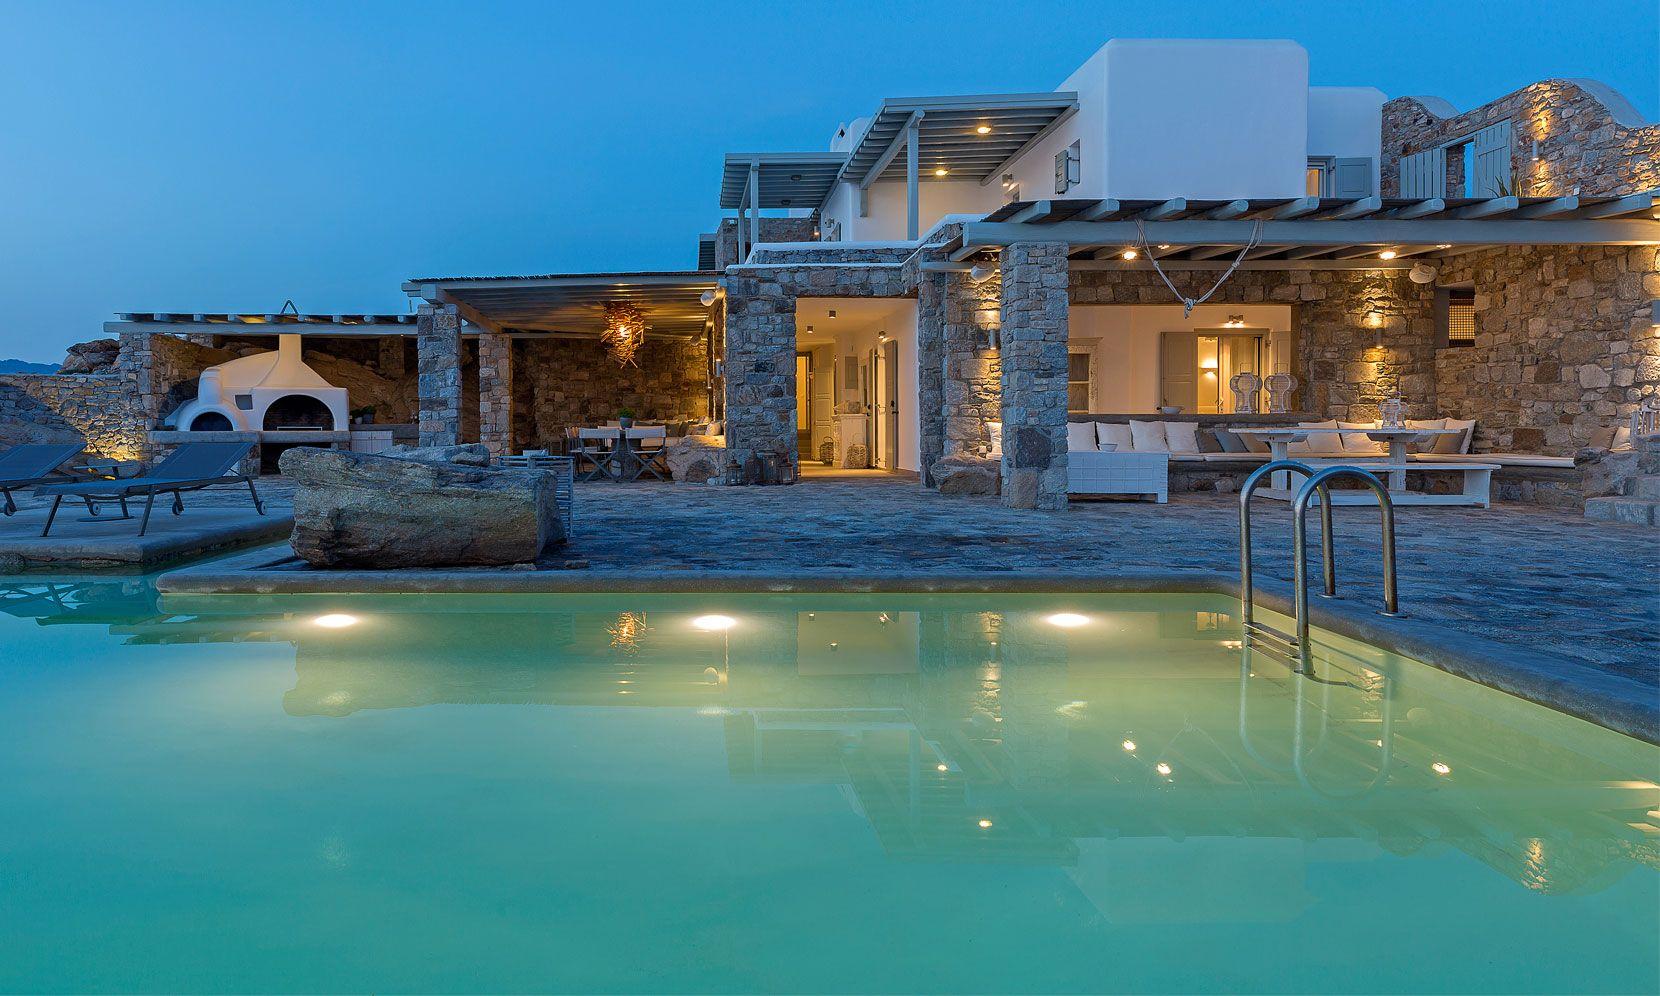 Mykonos Villa Zenais jumbotron image